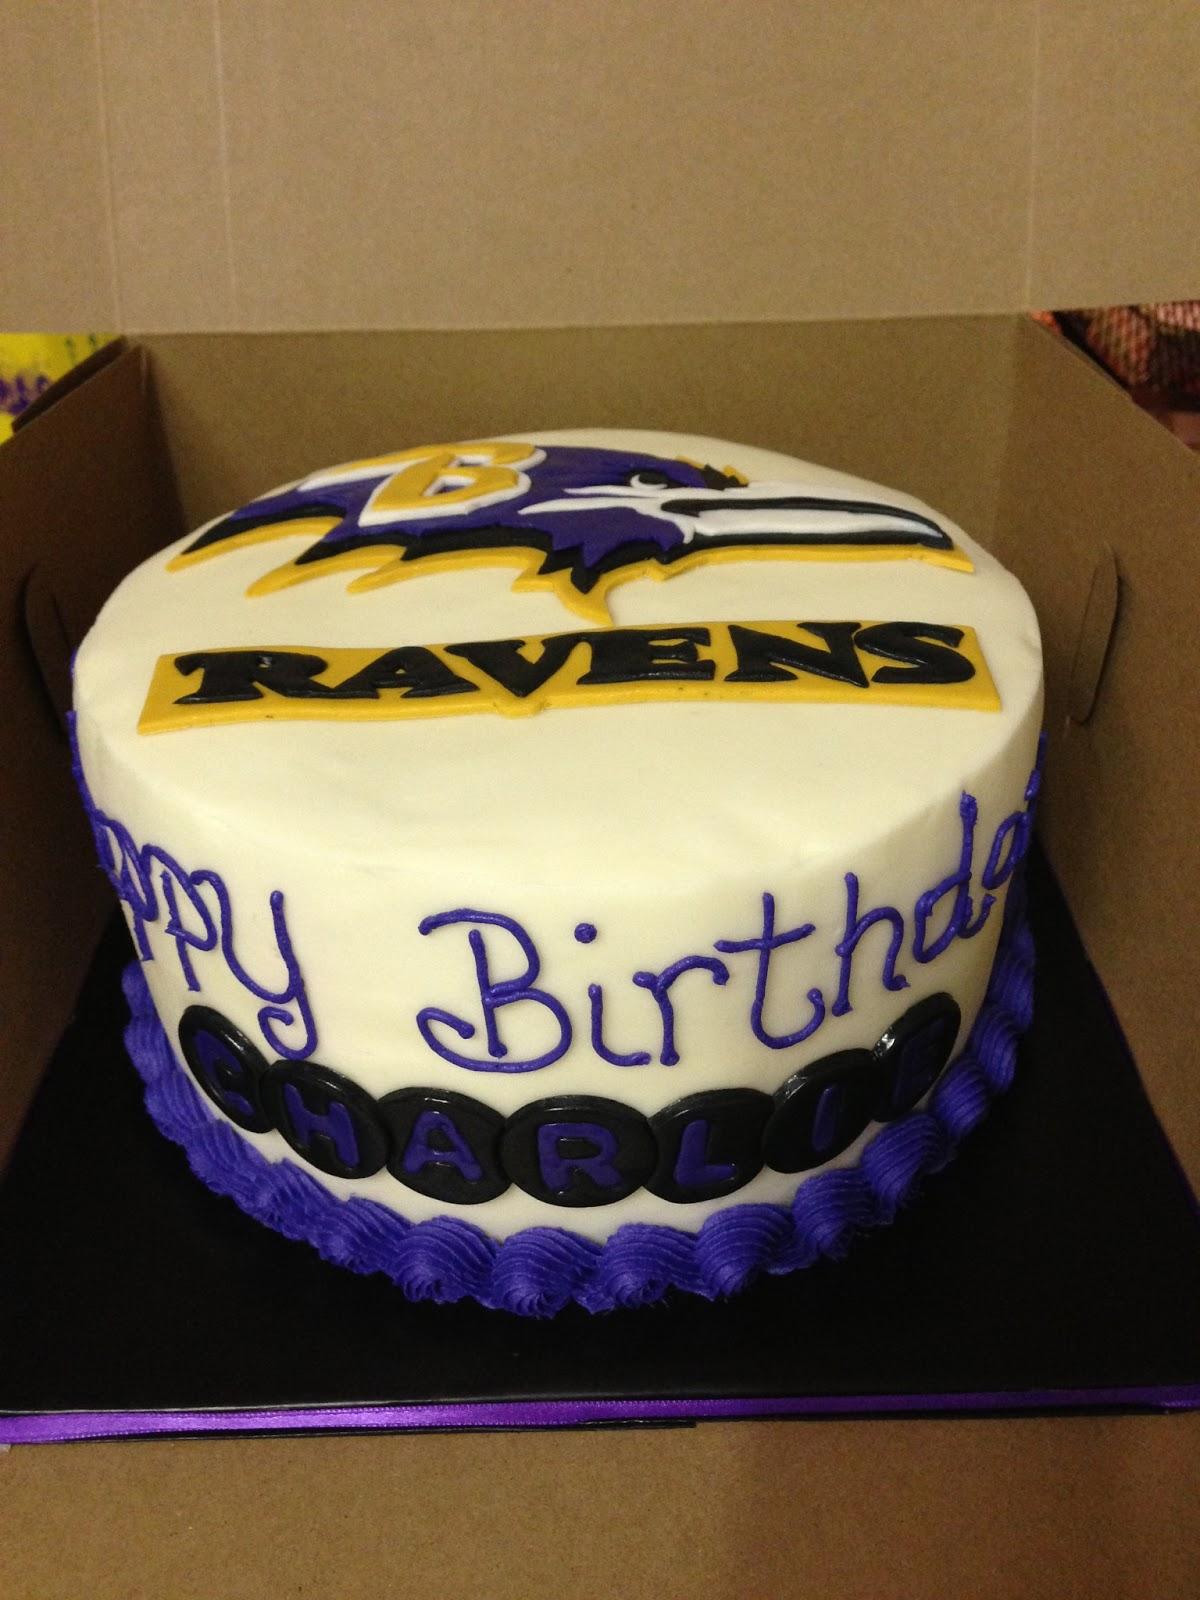 Birthday cakes in baltimore md - Mountain peak resort